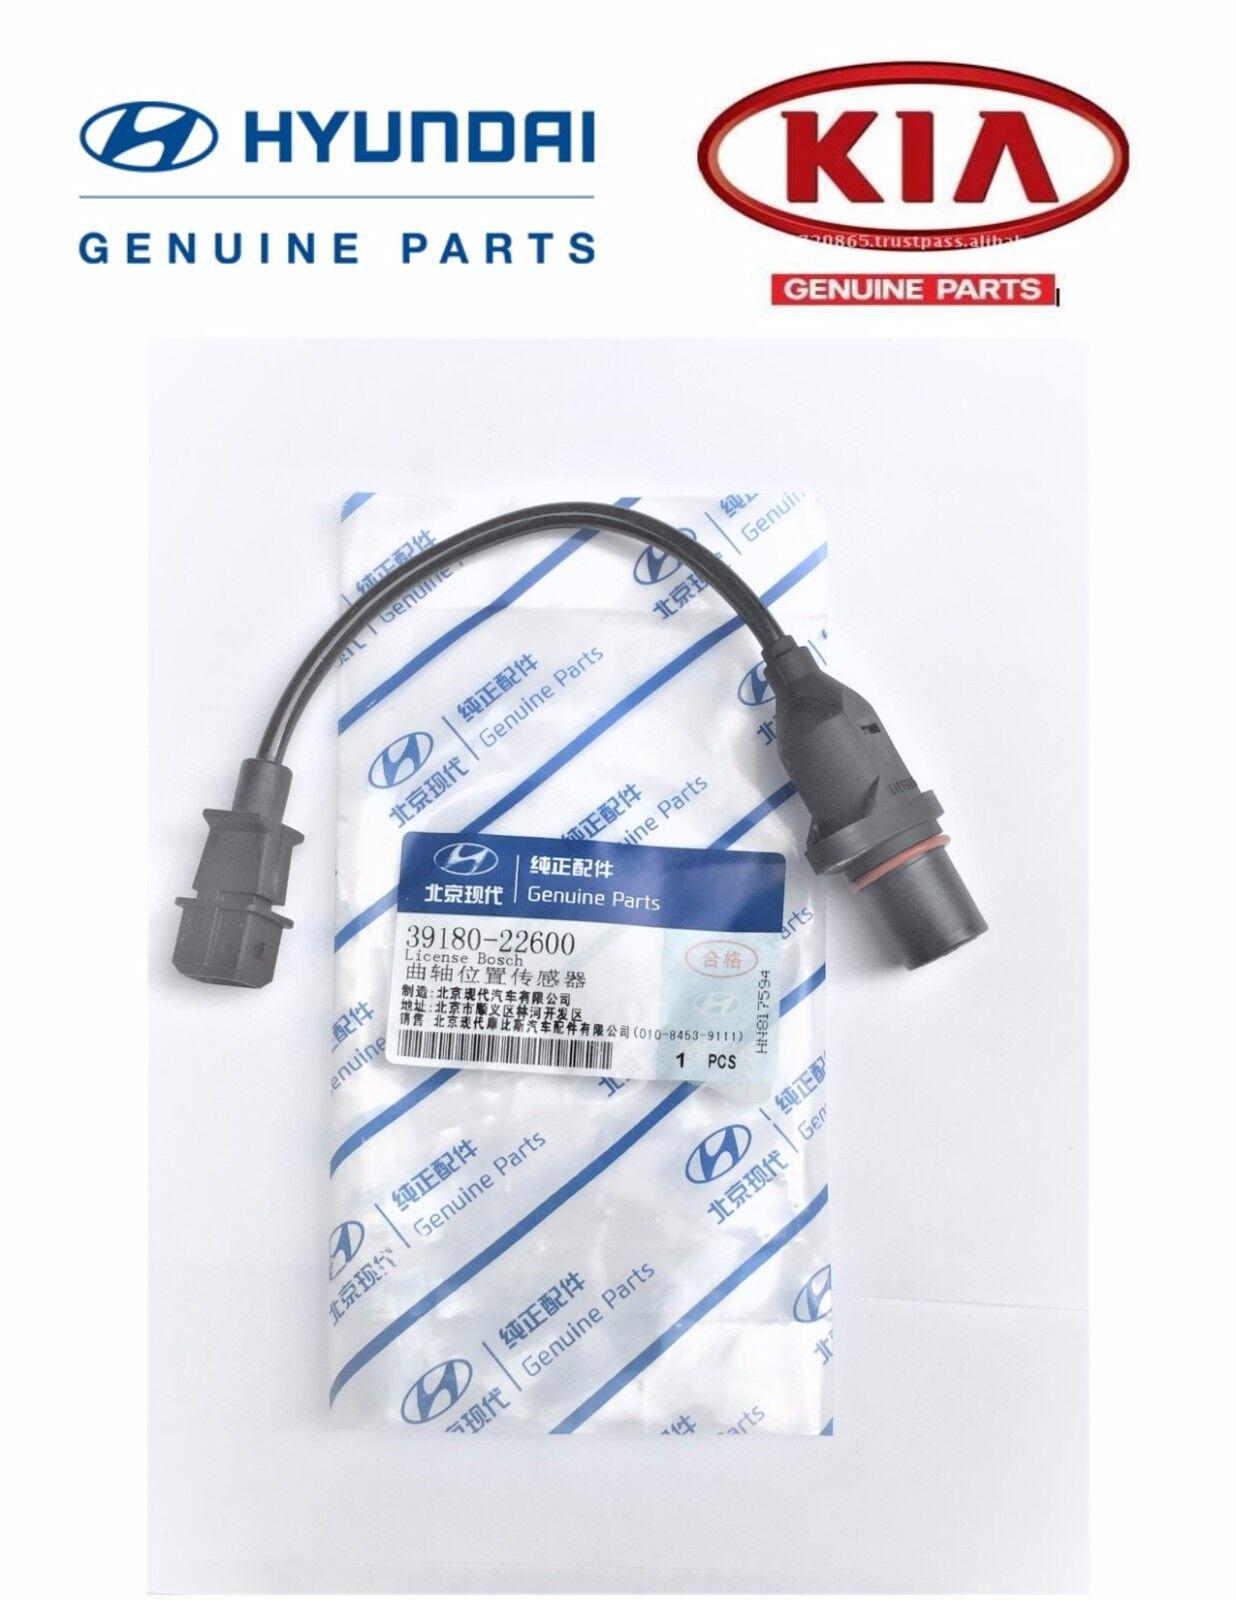 Genuine Hyundai 39180-22600 Crankshaft Position Sensor